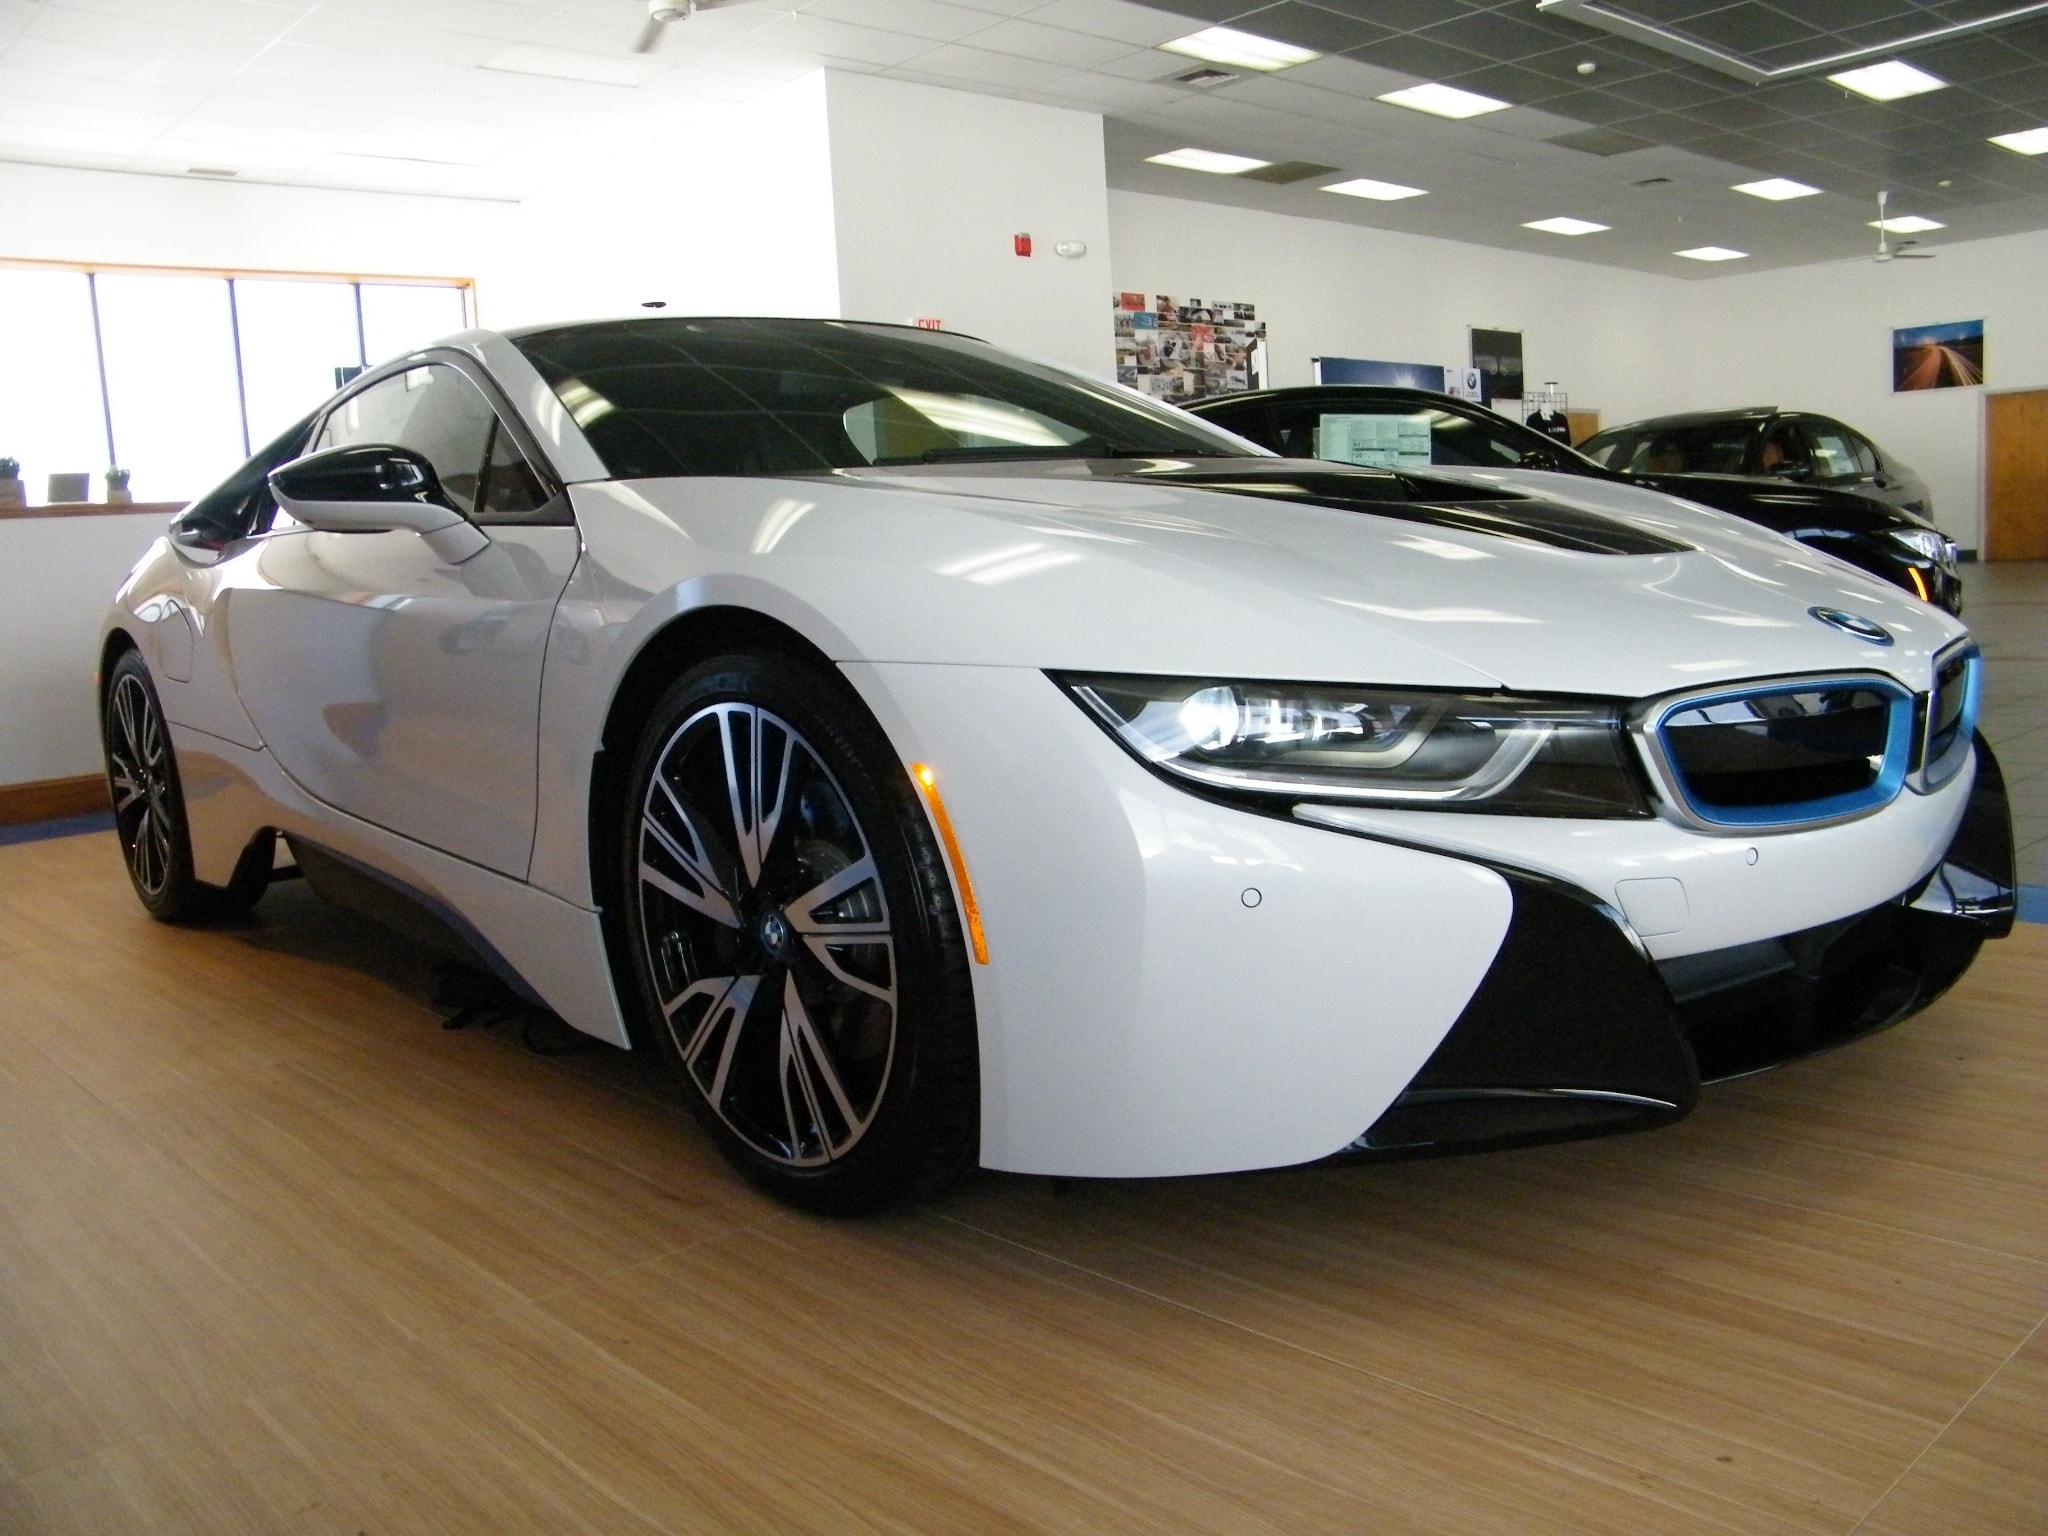 New 2015 BMW i8, $142295